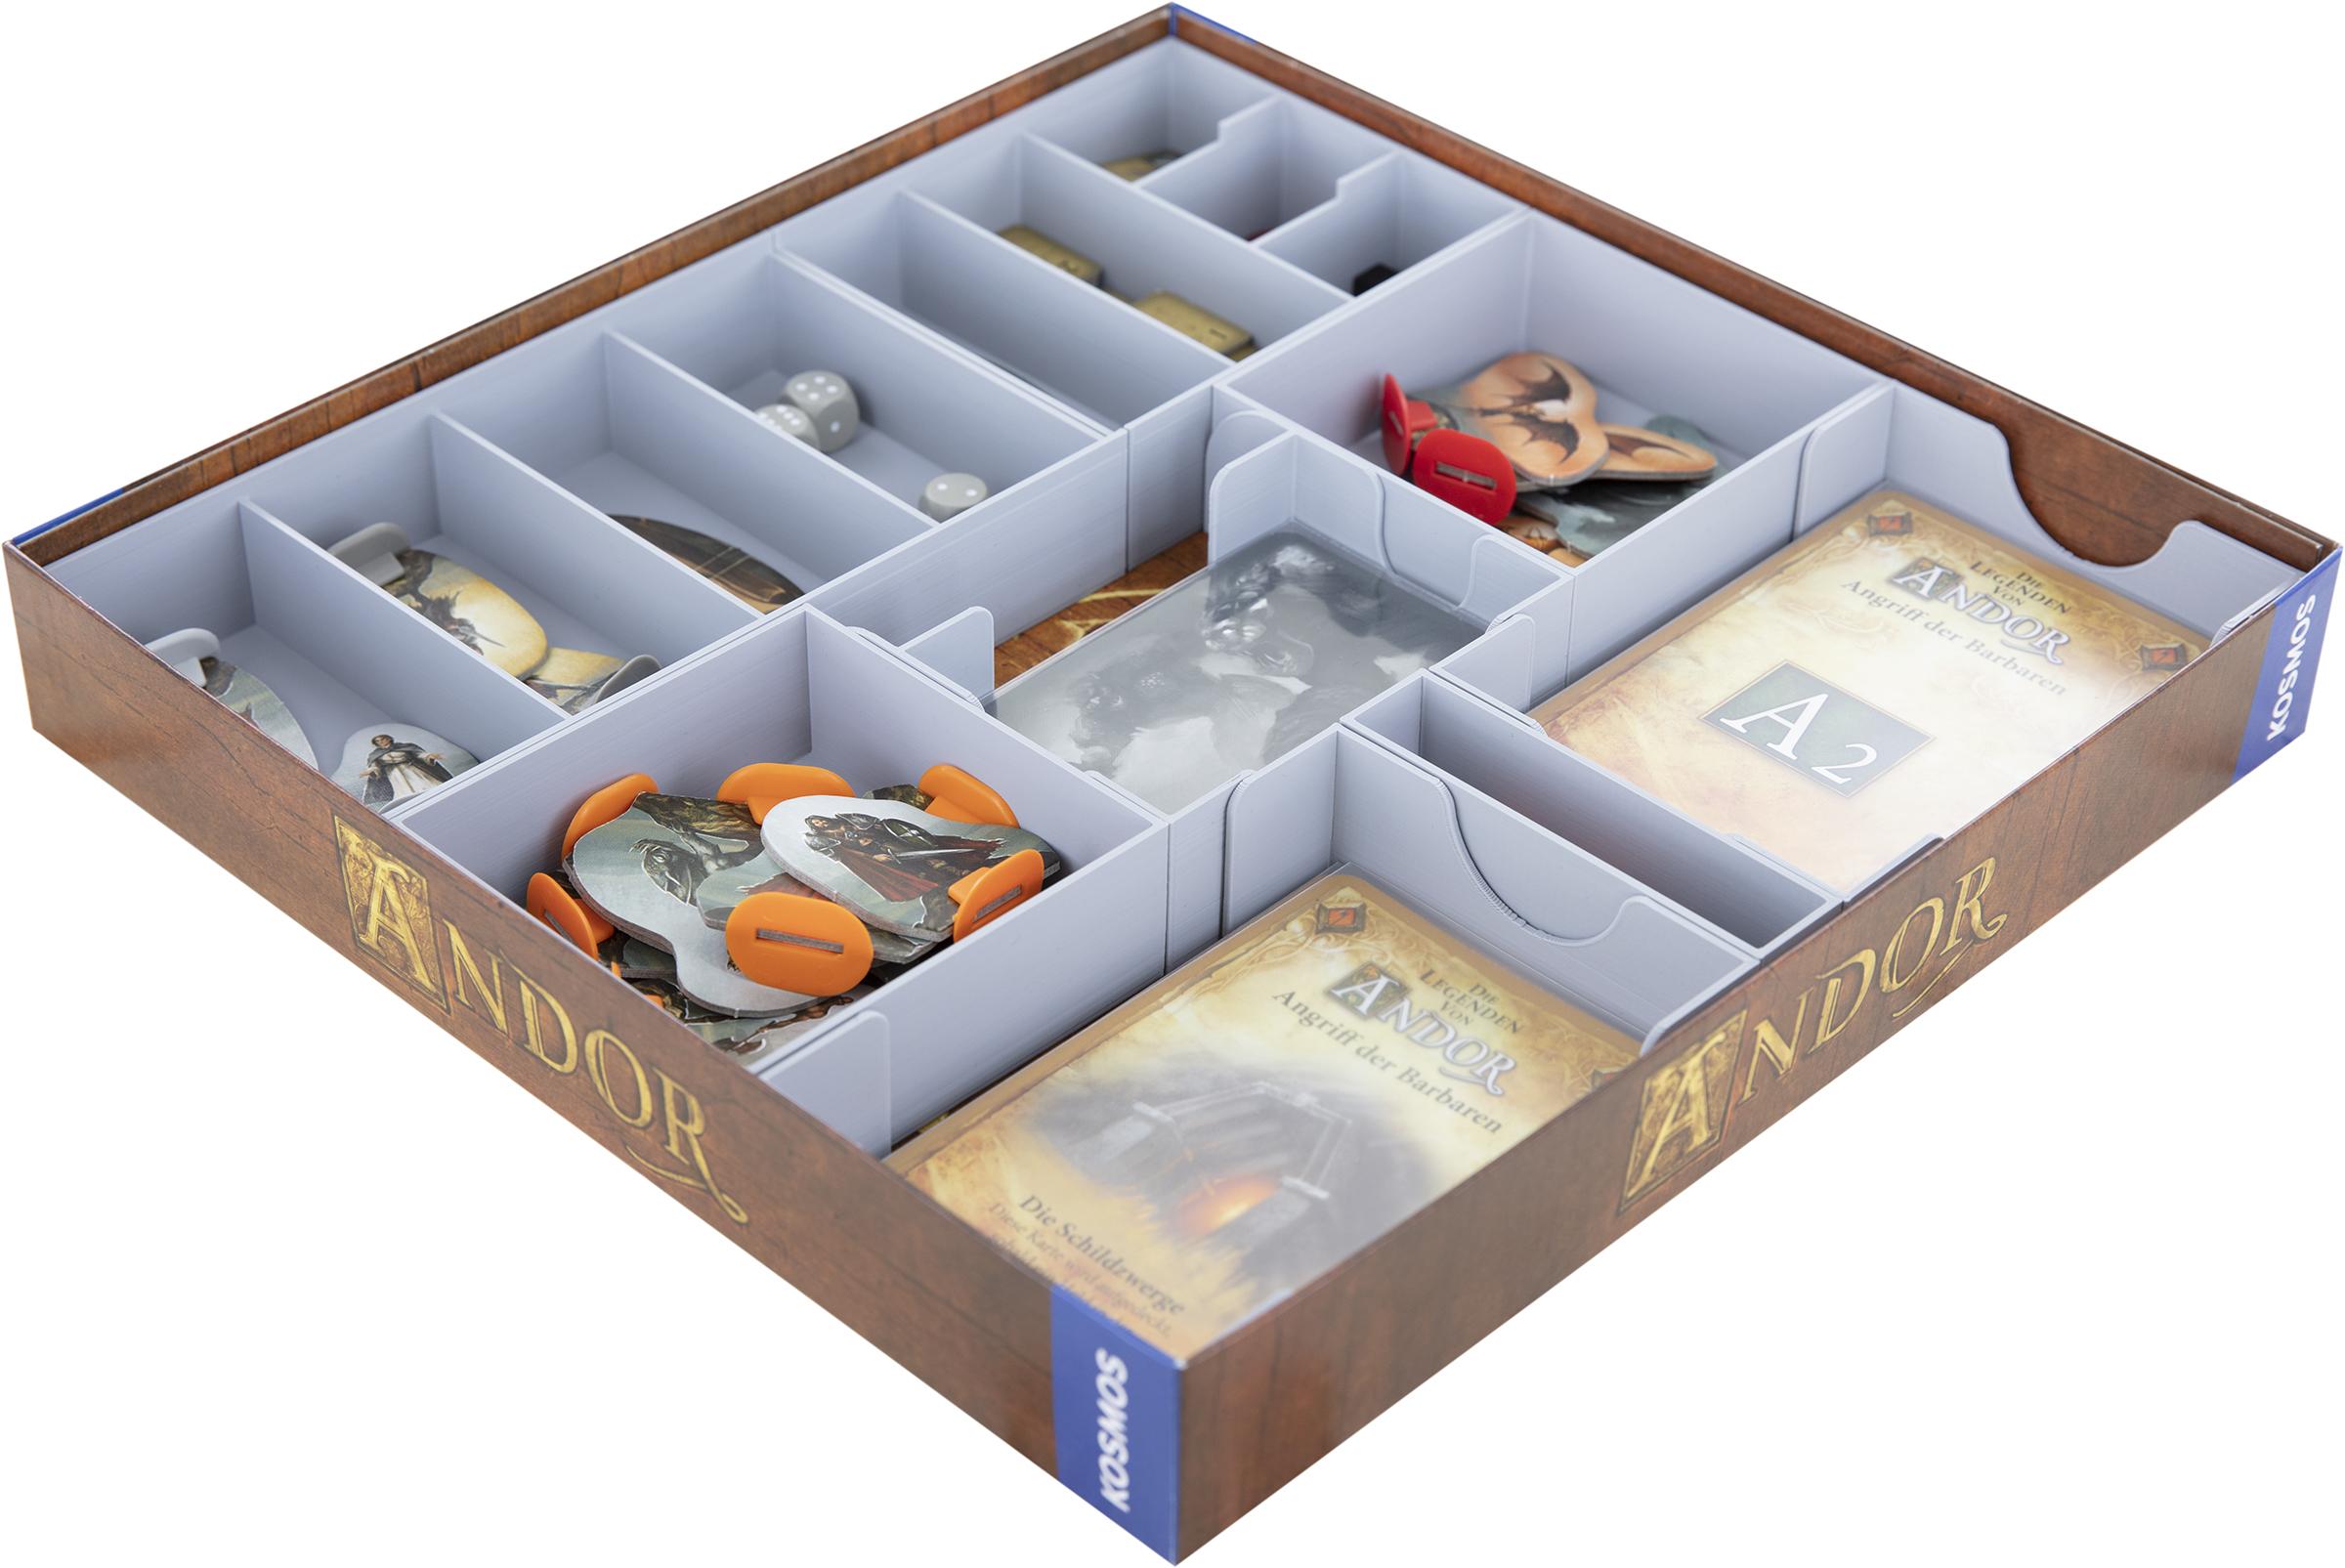 Feldherr Organizer for The Legends of Andor: The Bonus Box